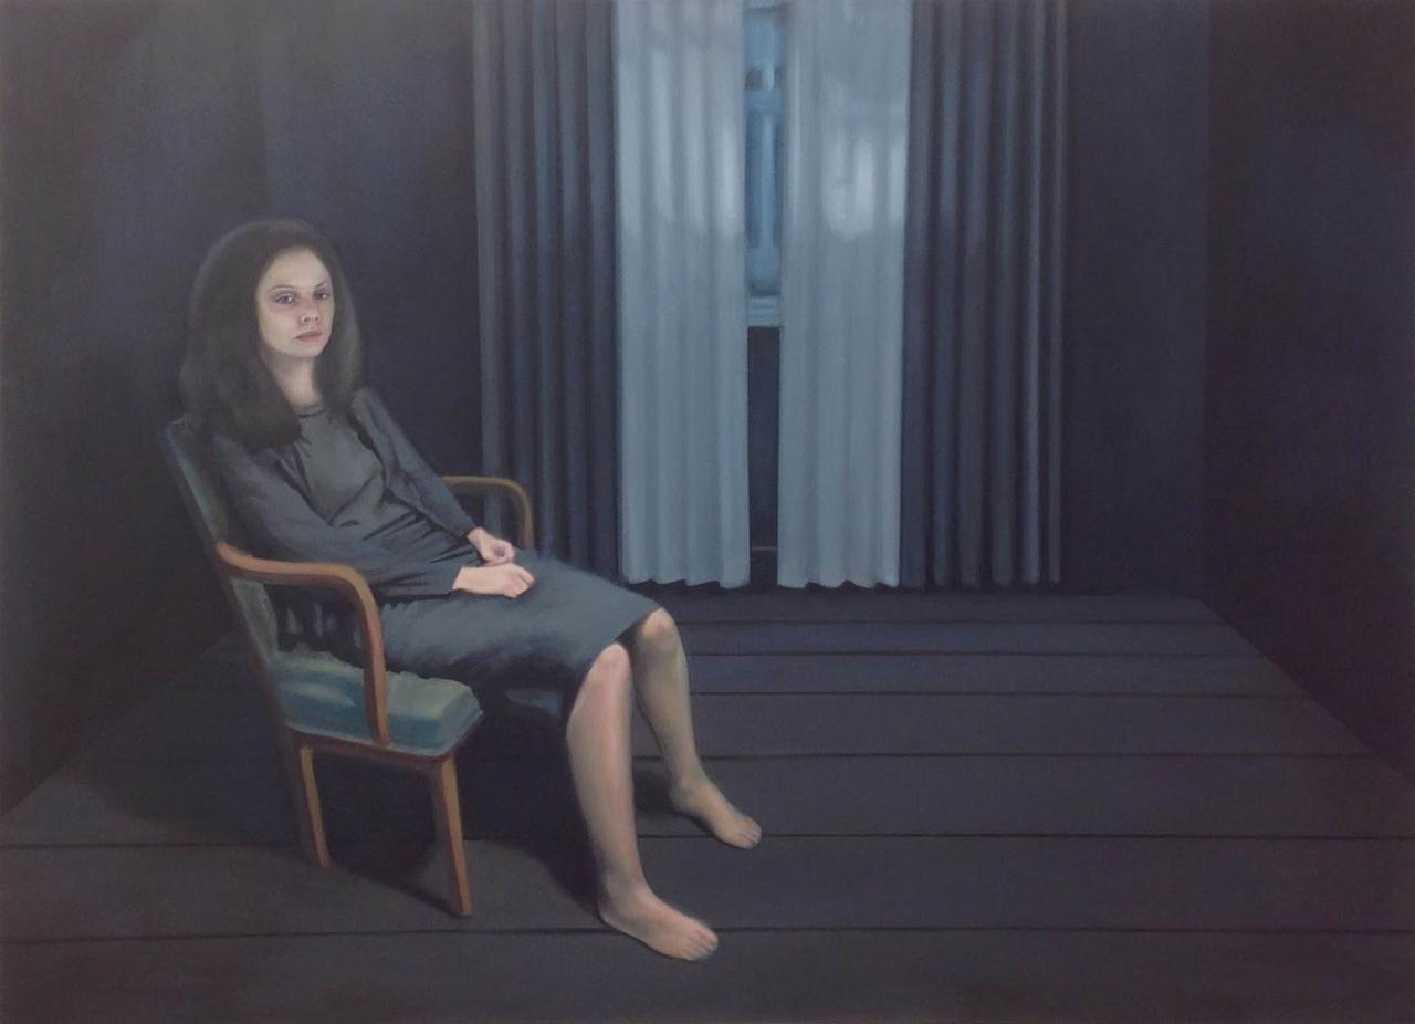 Dark Room, oil on canvas, 110 x 150 cm, 2016